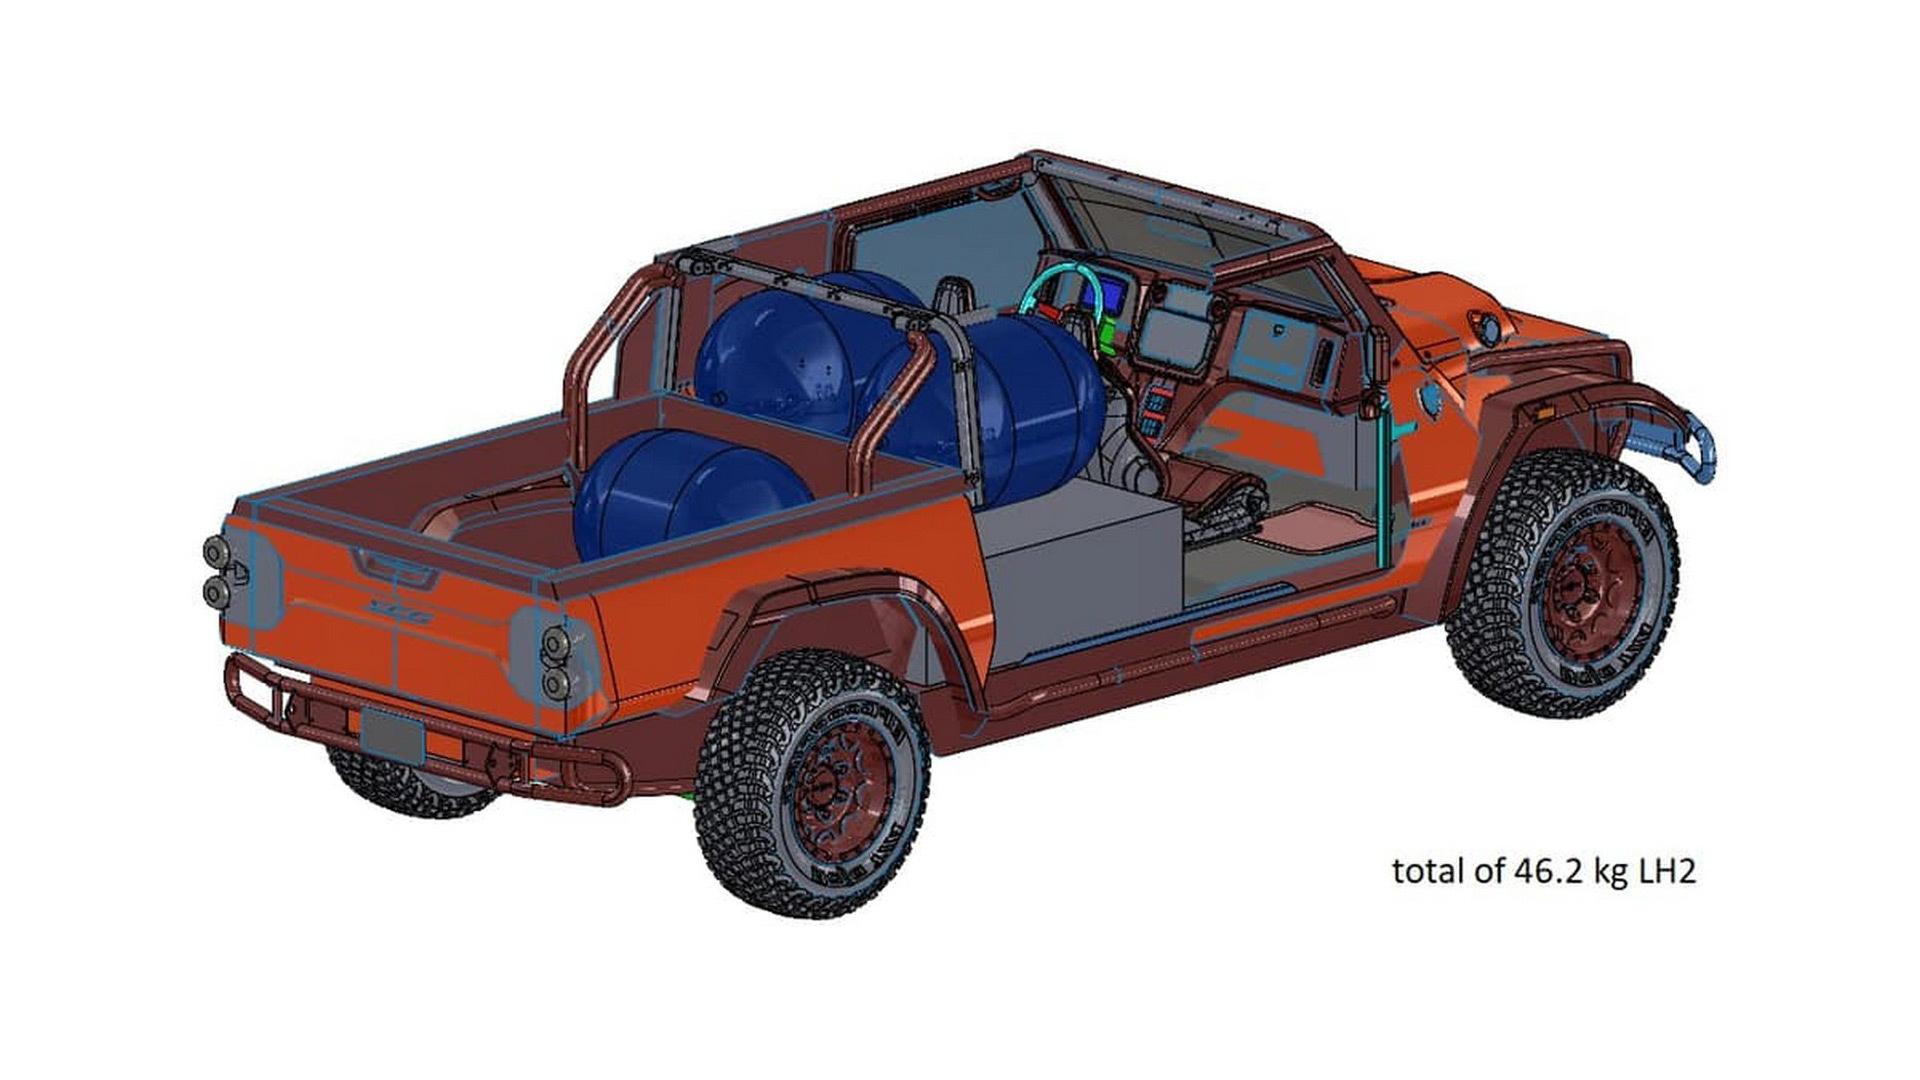 Glickenhaus Zero Emission Hydrogen Fuel Cell Boot Pickup concept